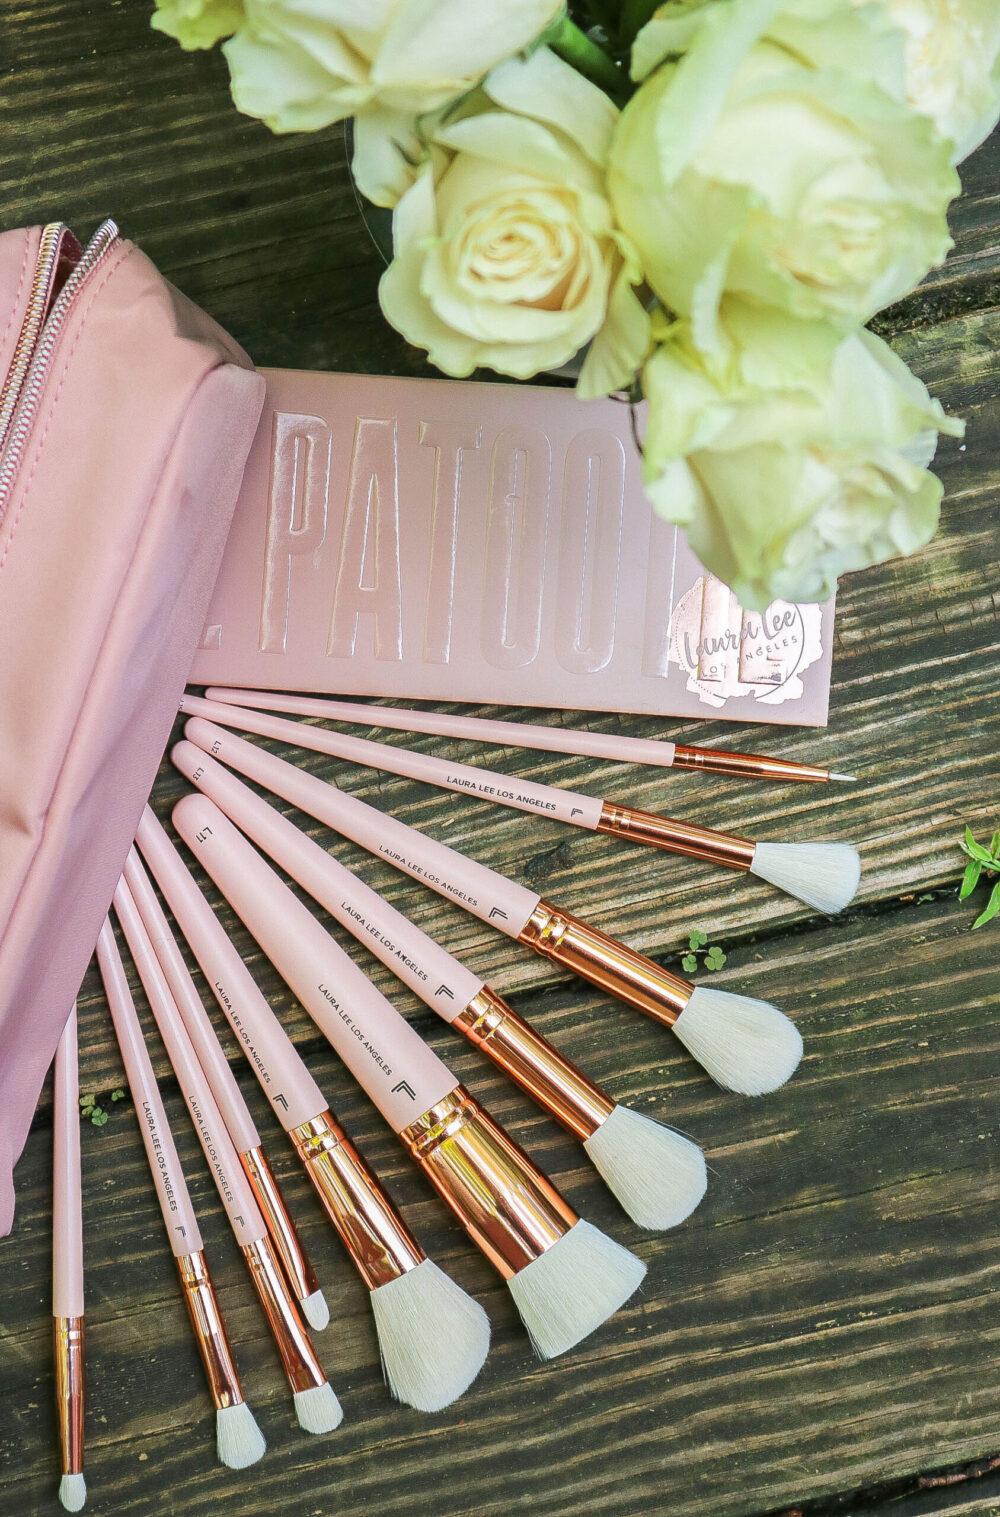 Laura Lee Makeup Brushes Review I DreaminLace.com #BeautyBlog #CrueltyFreeBeauty #MakeupBlog